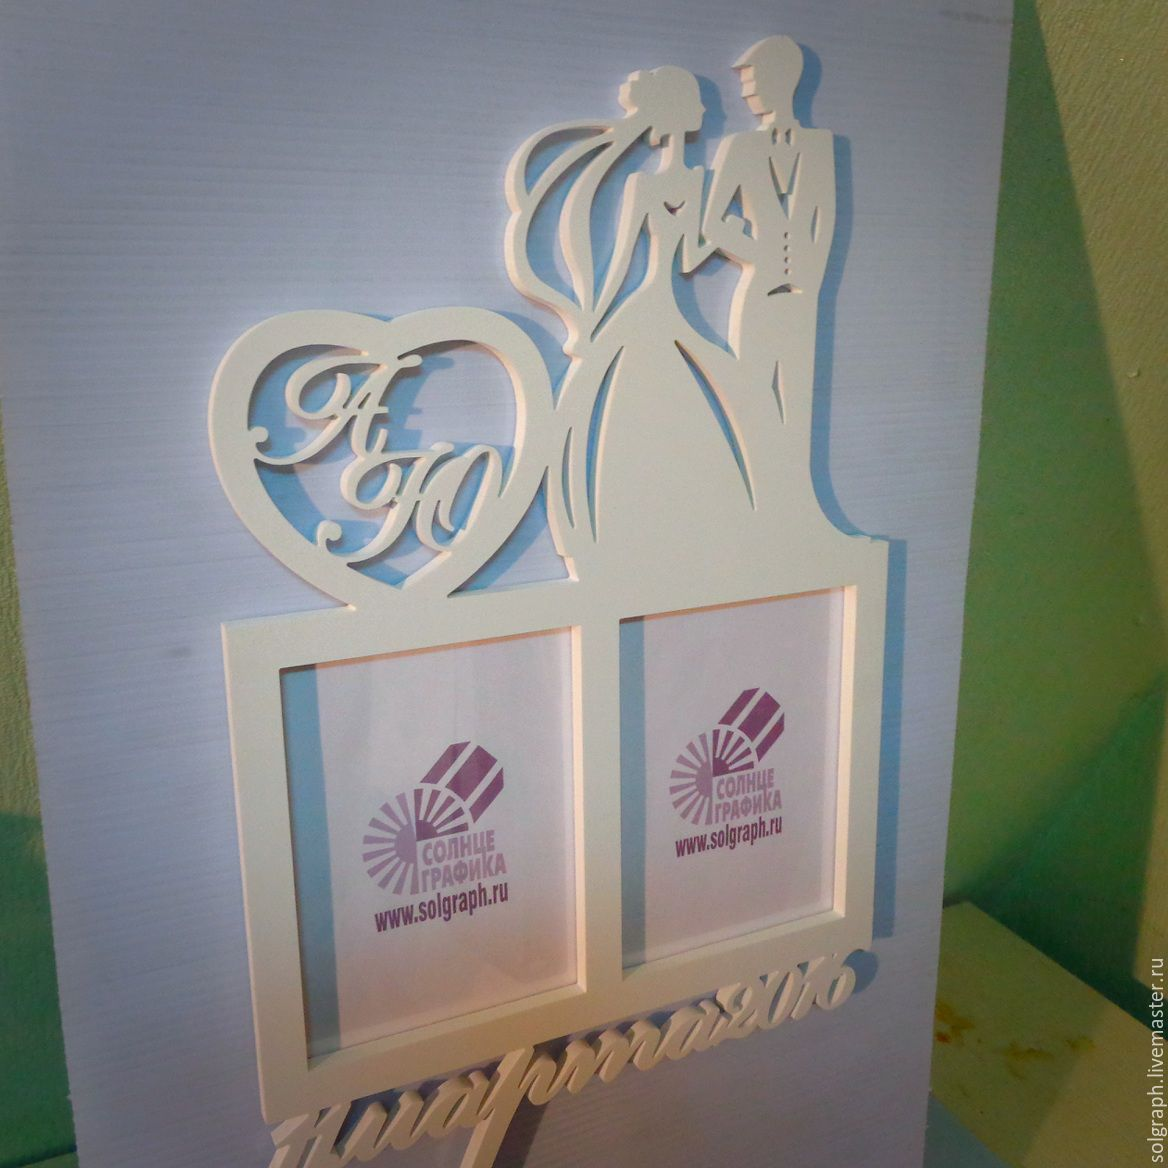 Рамки для свадебного подарка 462